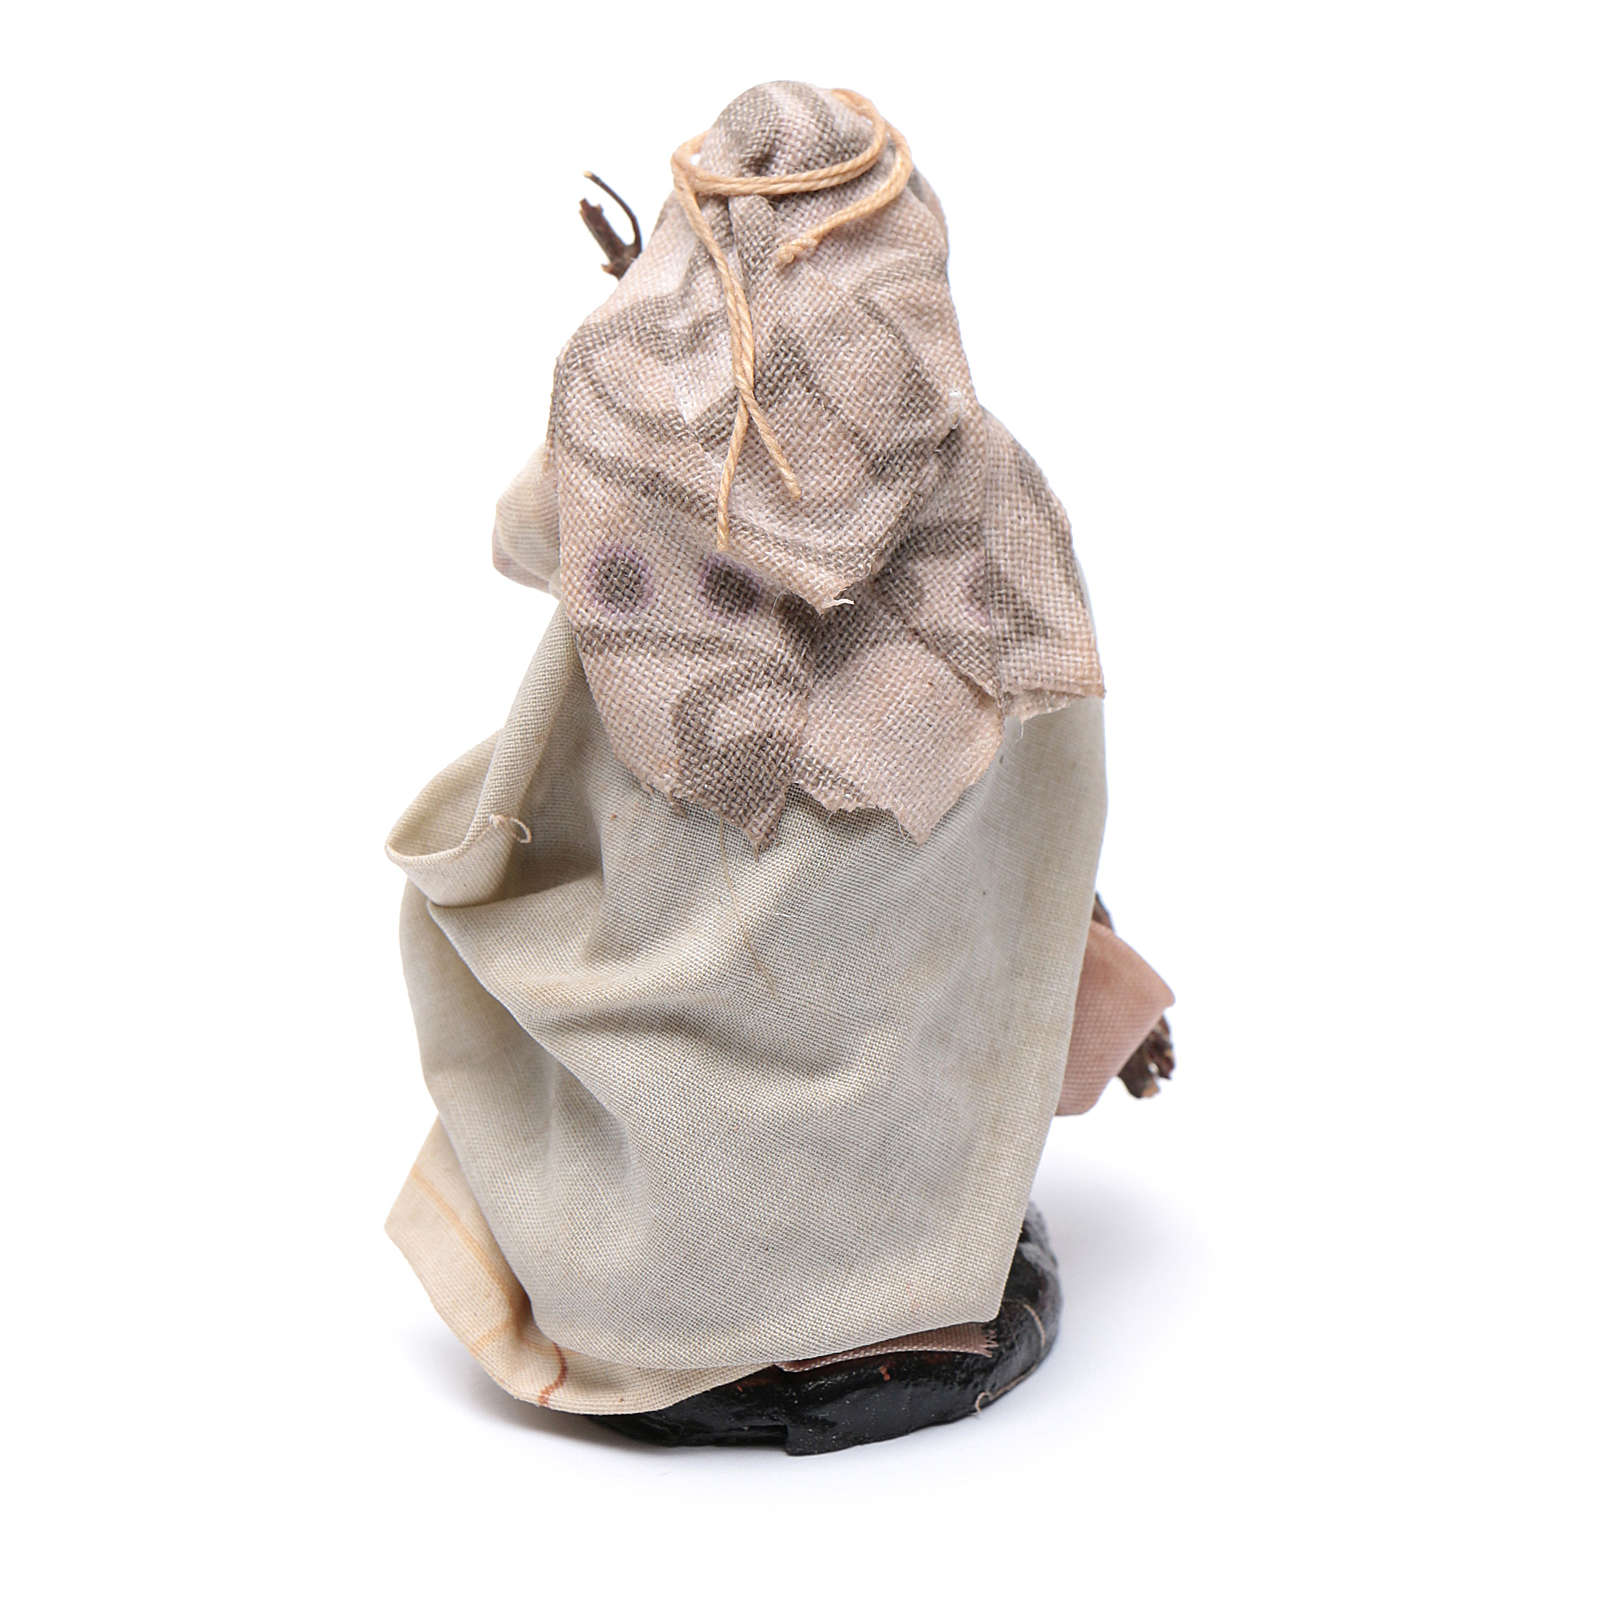 Neapolitan Nativity figurine, Old woman with broom 8cm 4